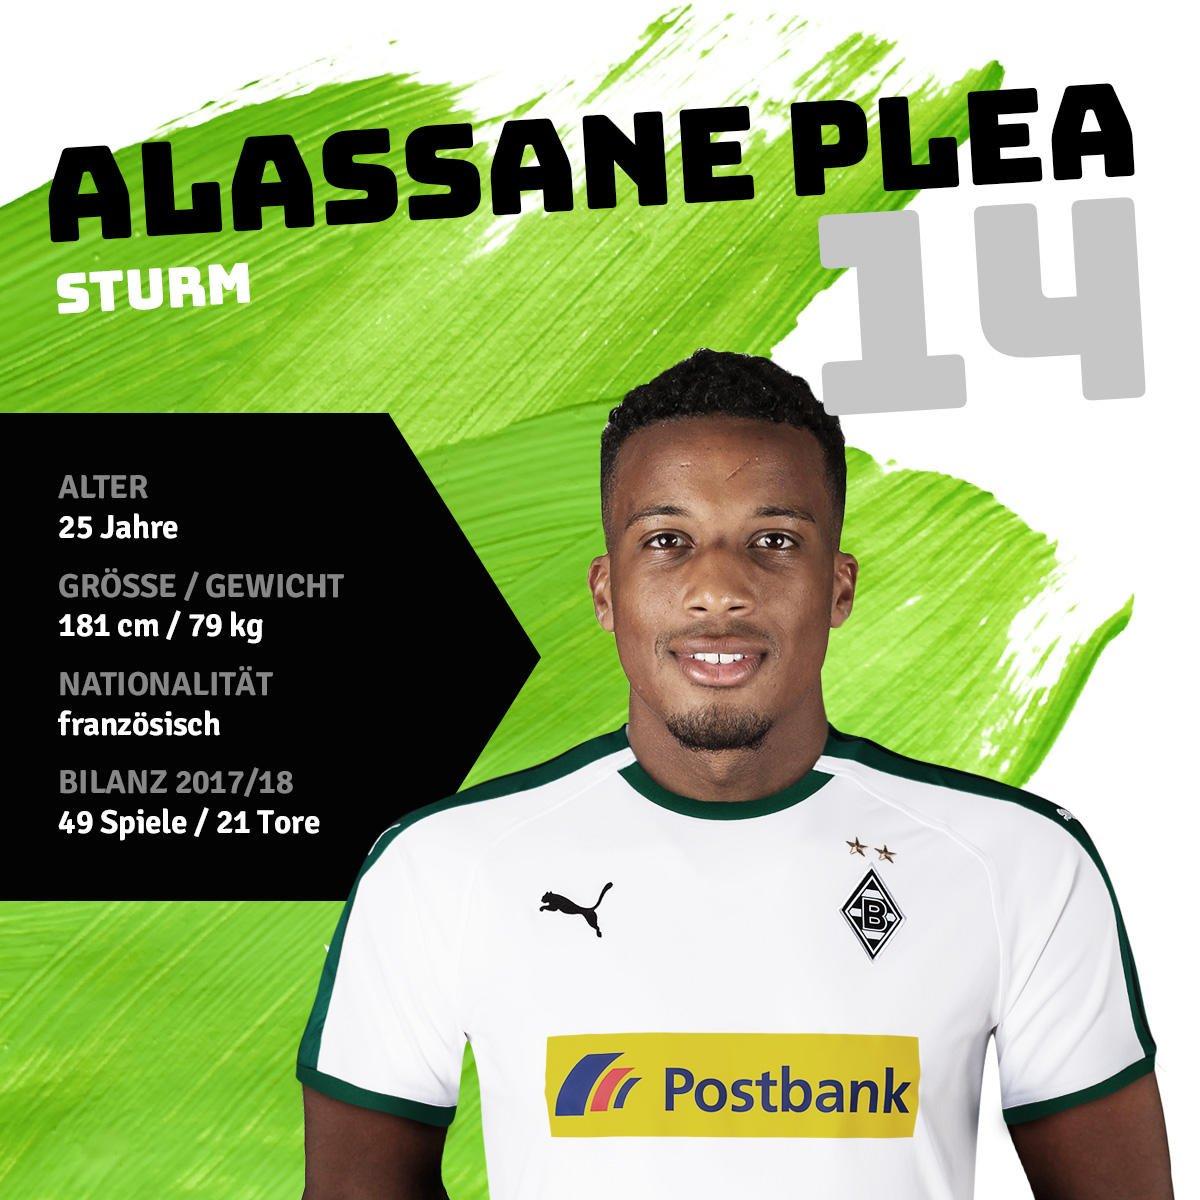 Alassane Plea